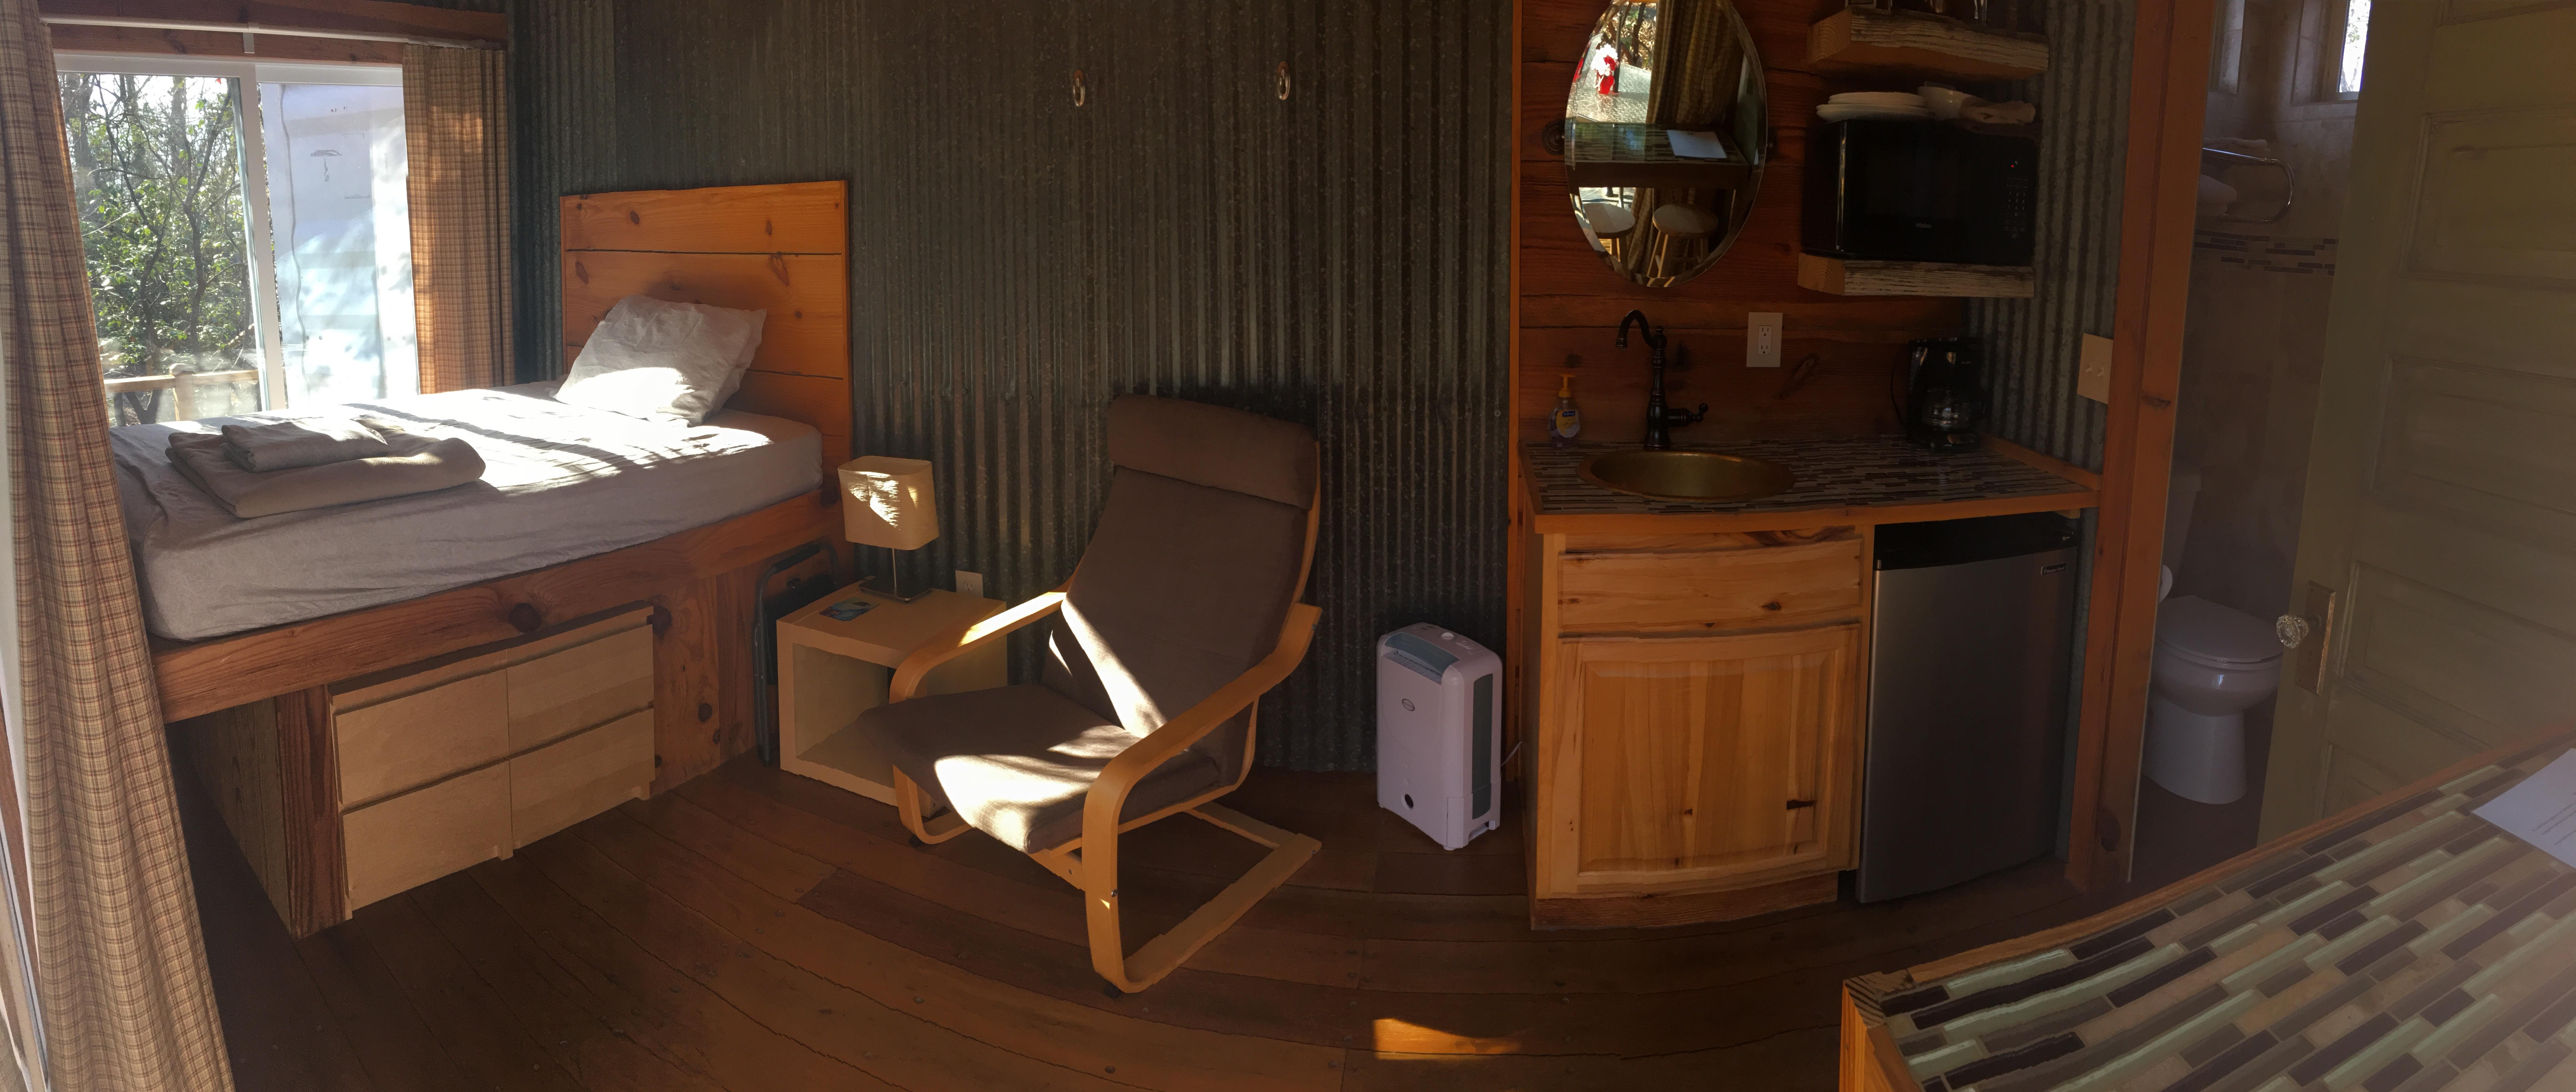 rentals hills dahlonega lodge suites georgia north ga at hotel in tree forrest resort rooms topper cabins